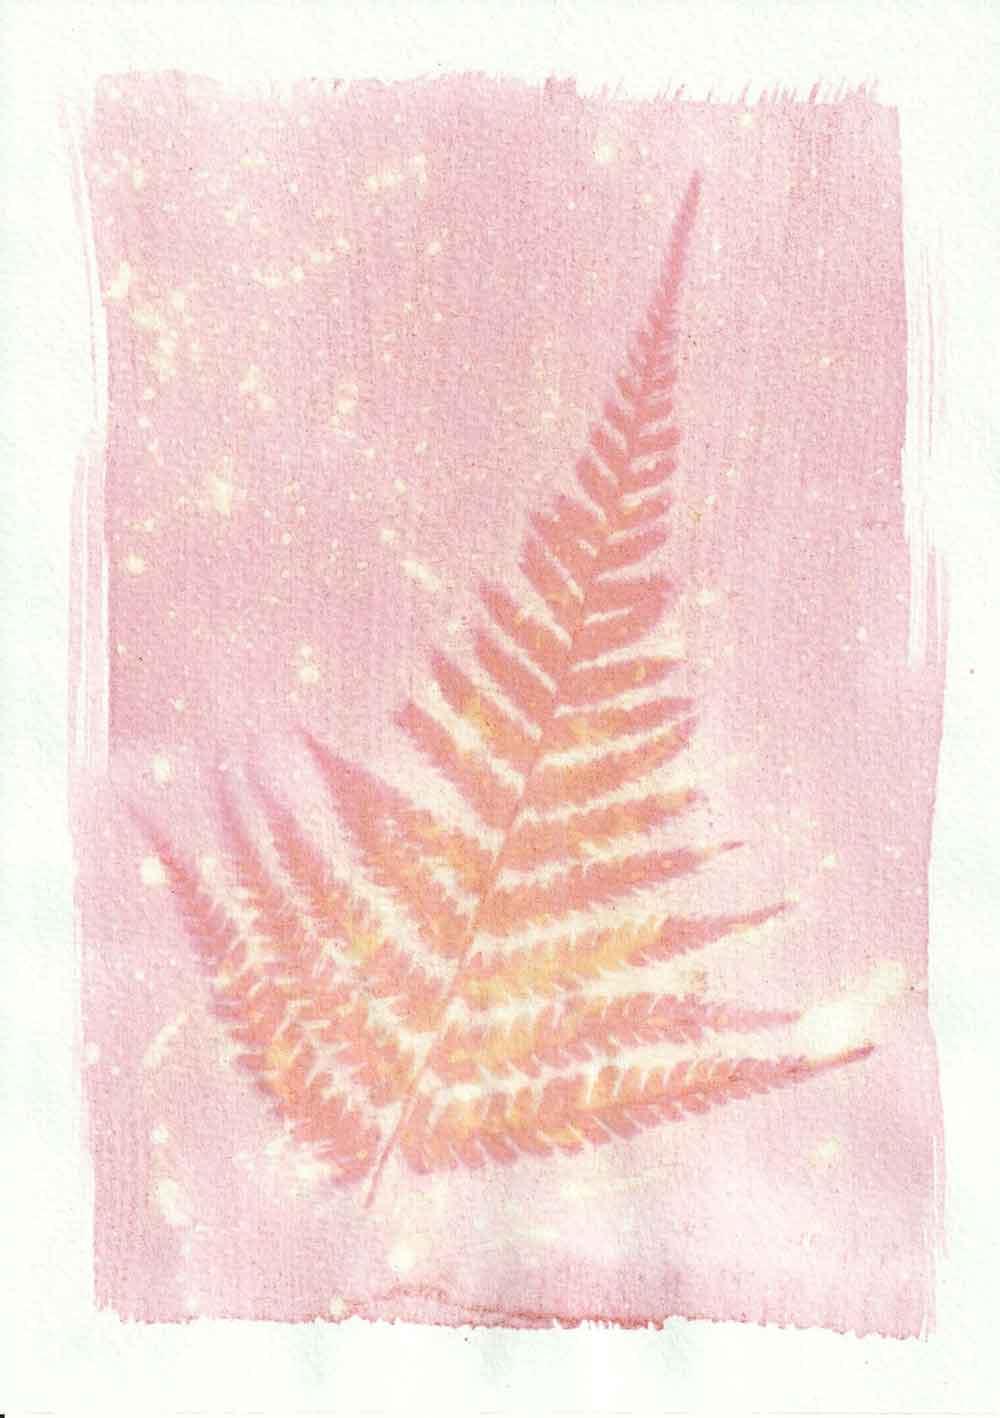 Braken anthotype prints by Tim Boddy